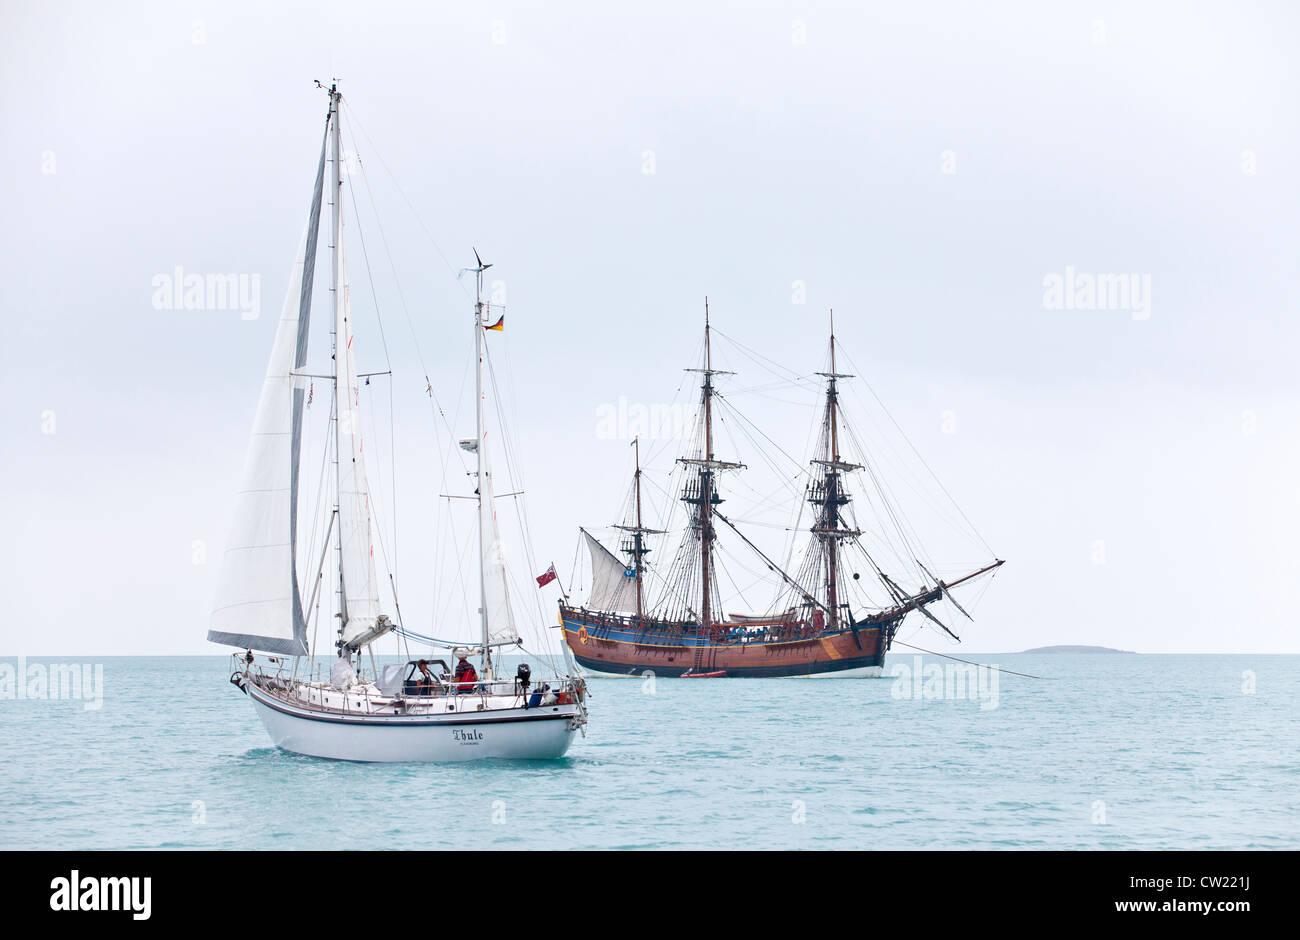 Captain Cooks vessel  Endevour meets  German sailing yacht in Torresstrait, Australia - Stock Image